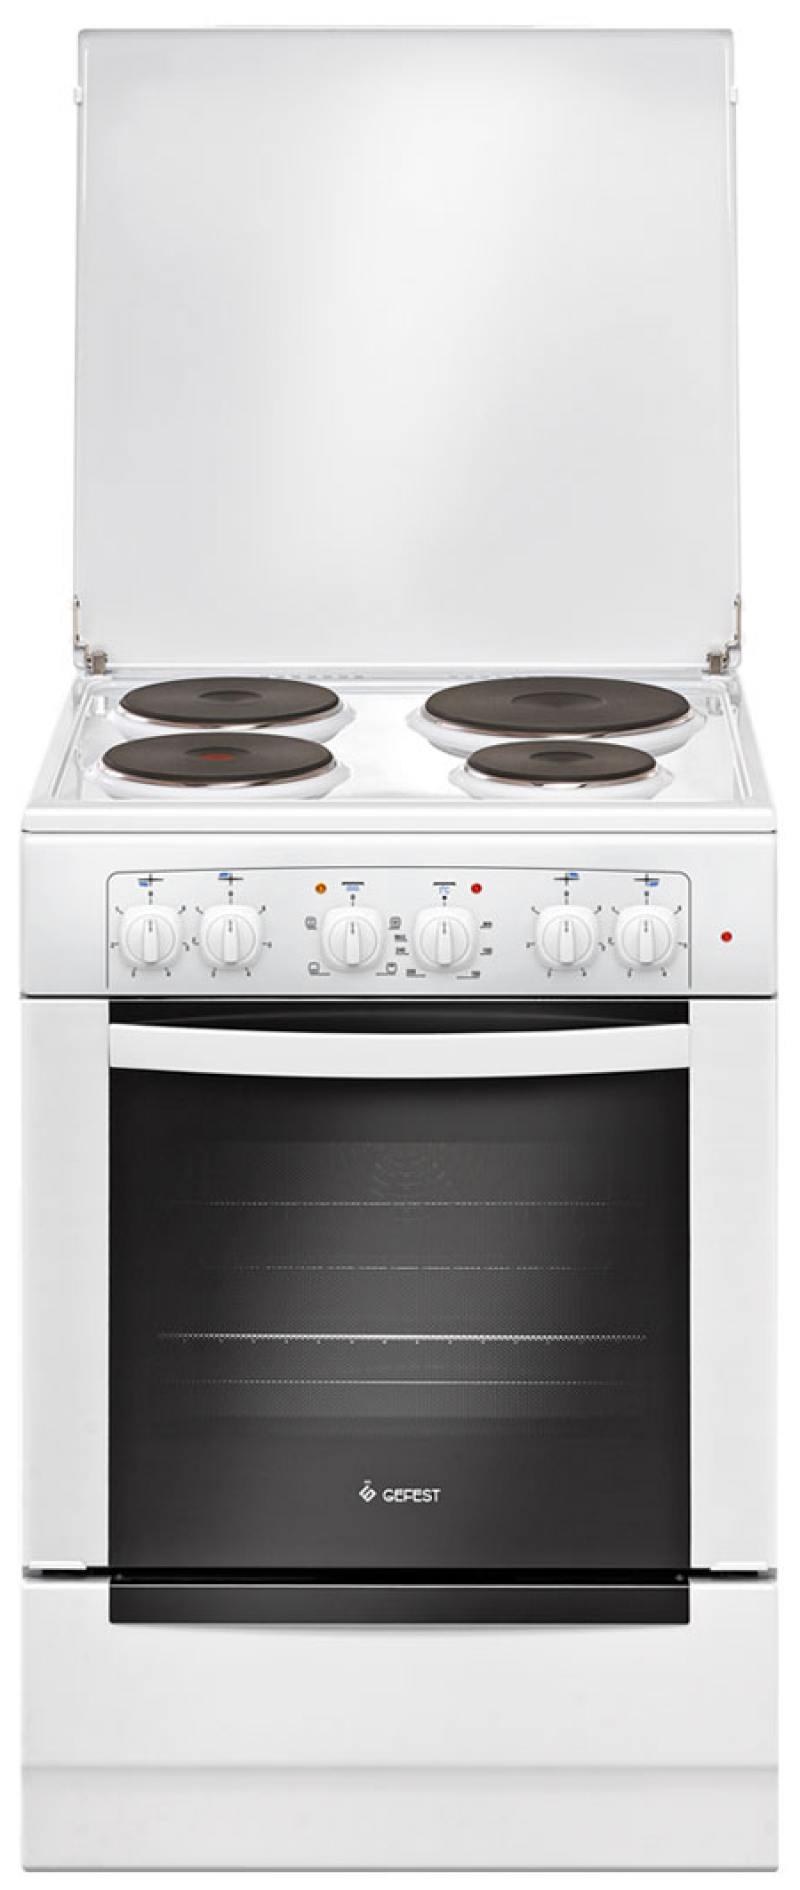 Электрическая плита Gefest 6140-01 цена и фото